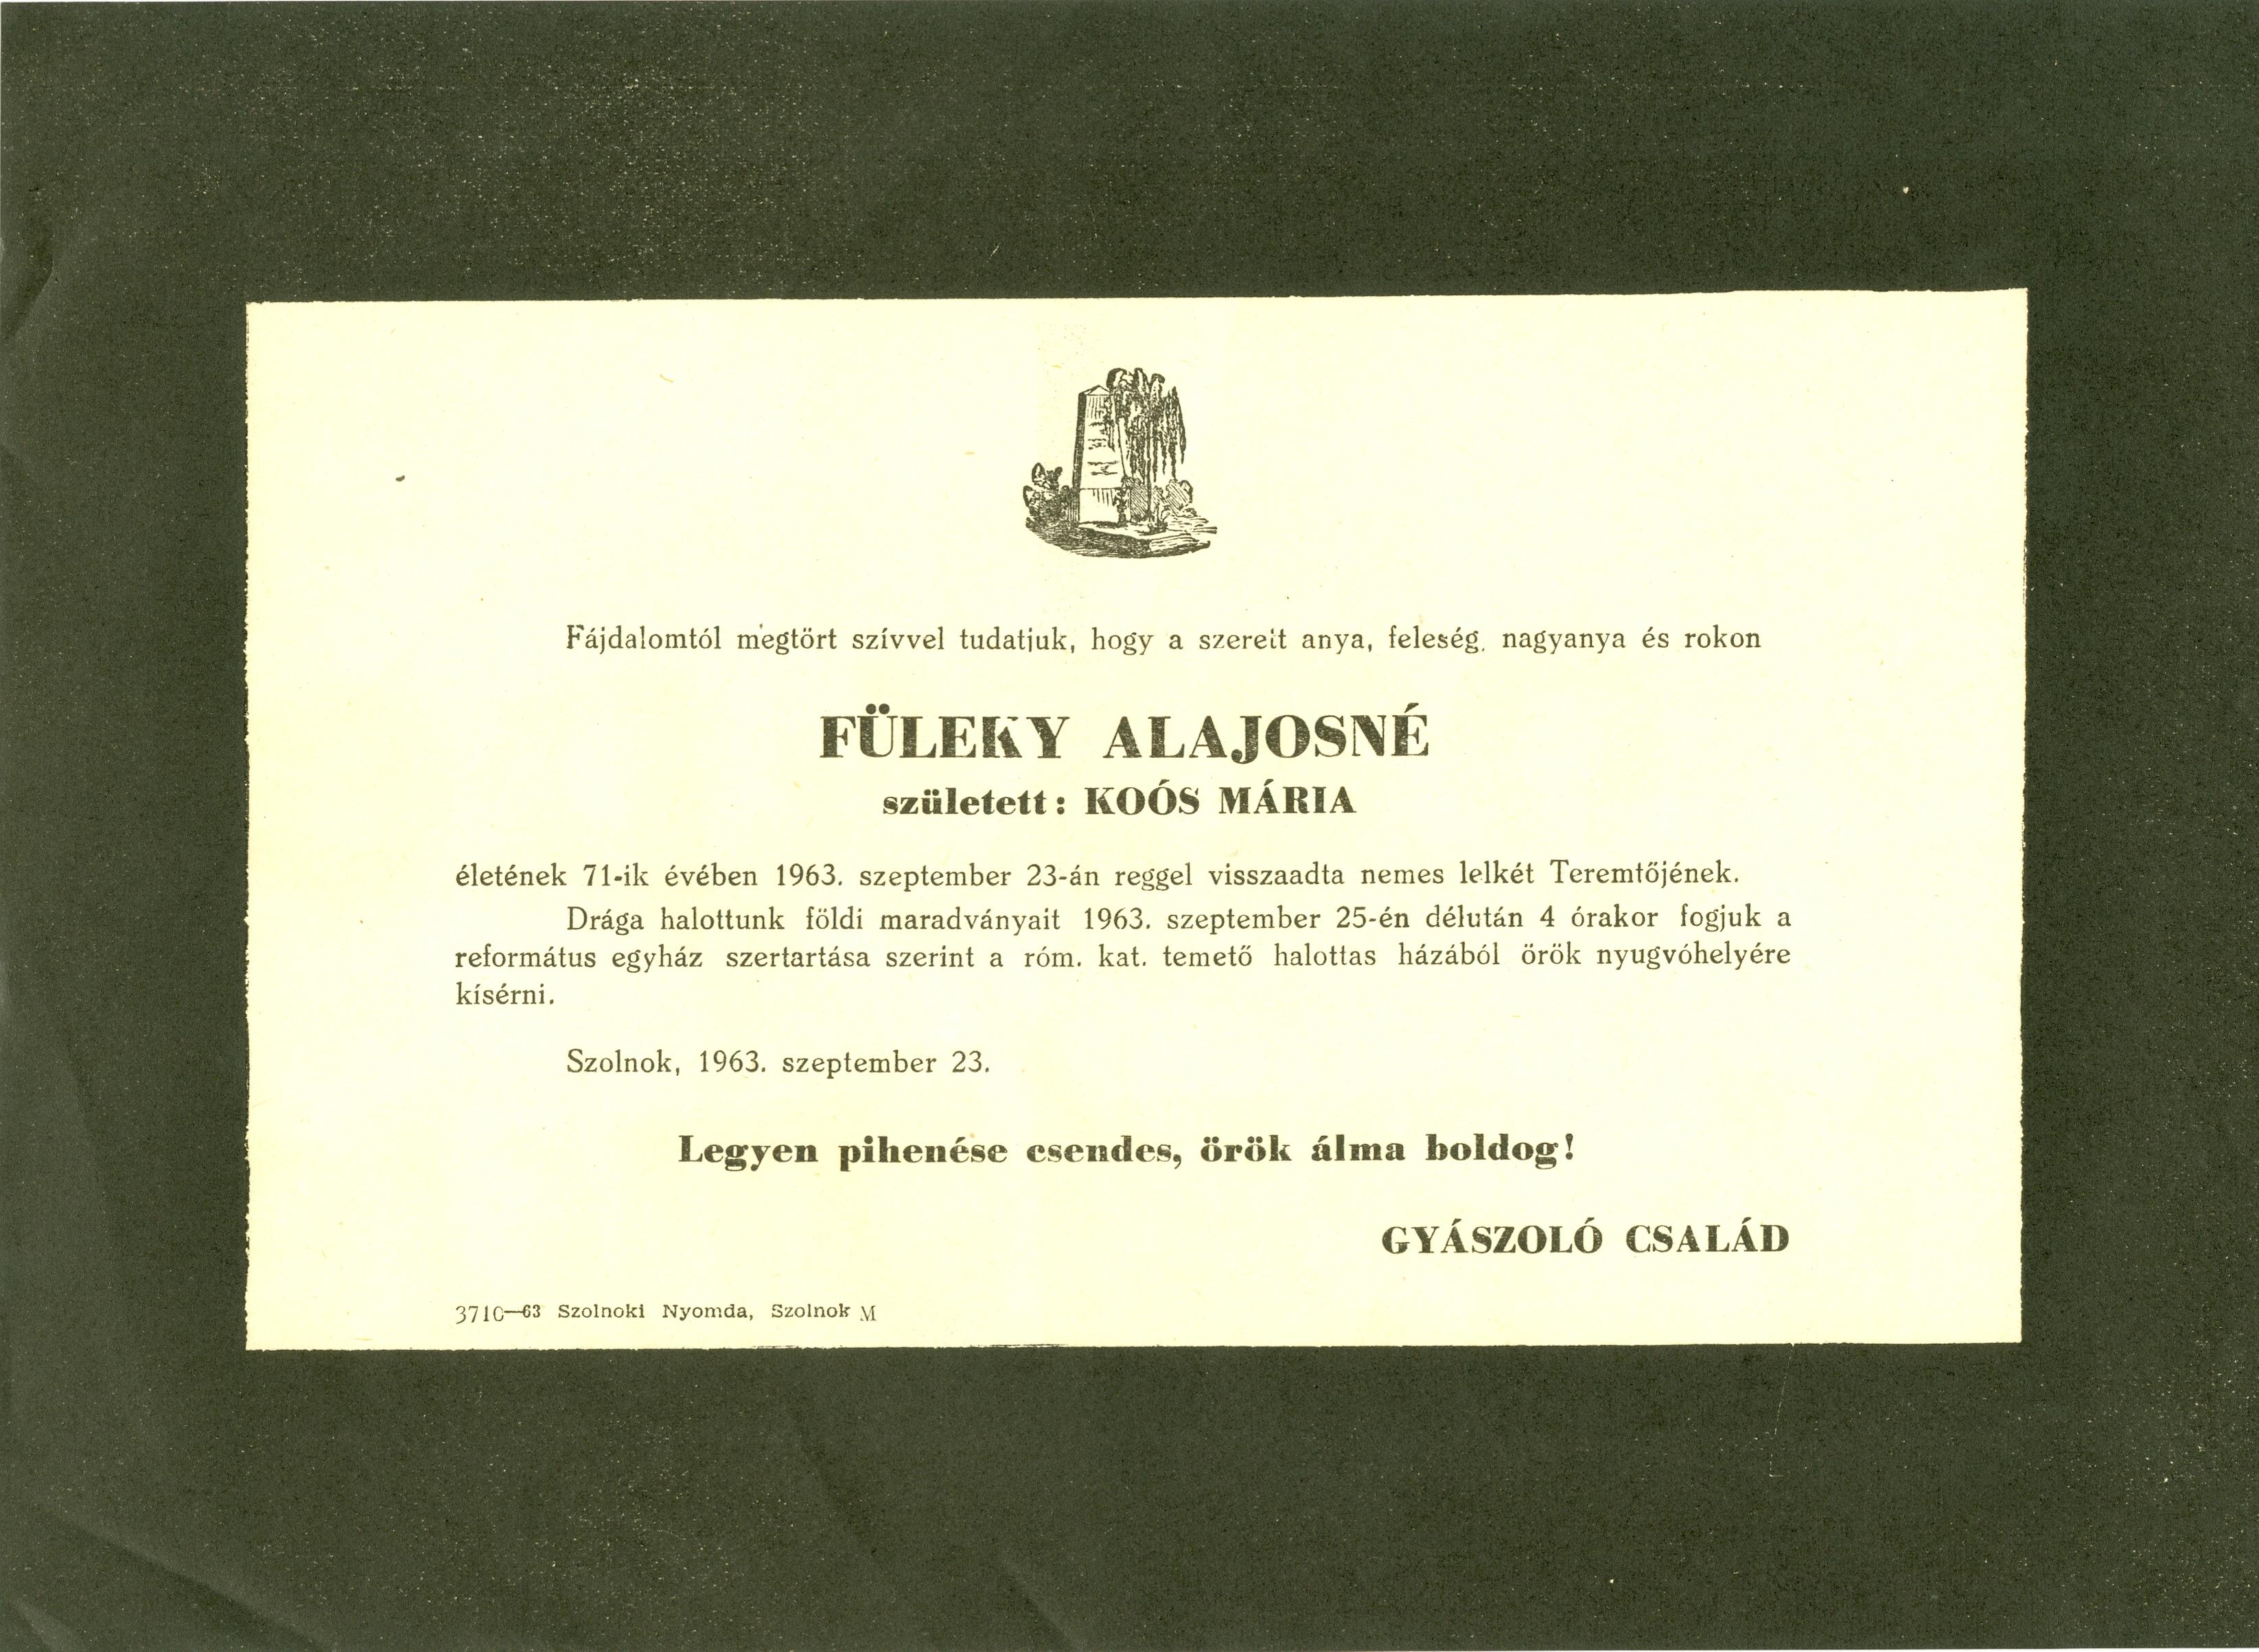 Füleki Alajosné